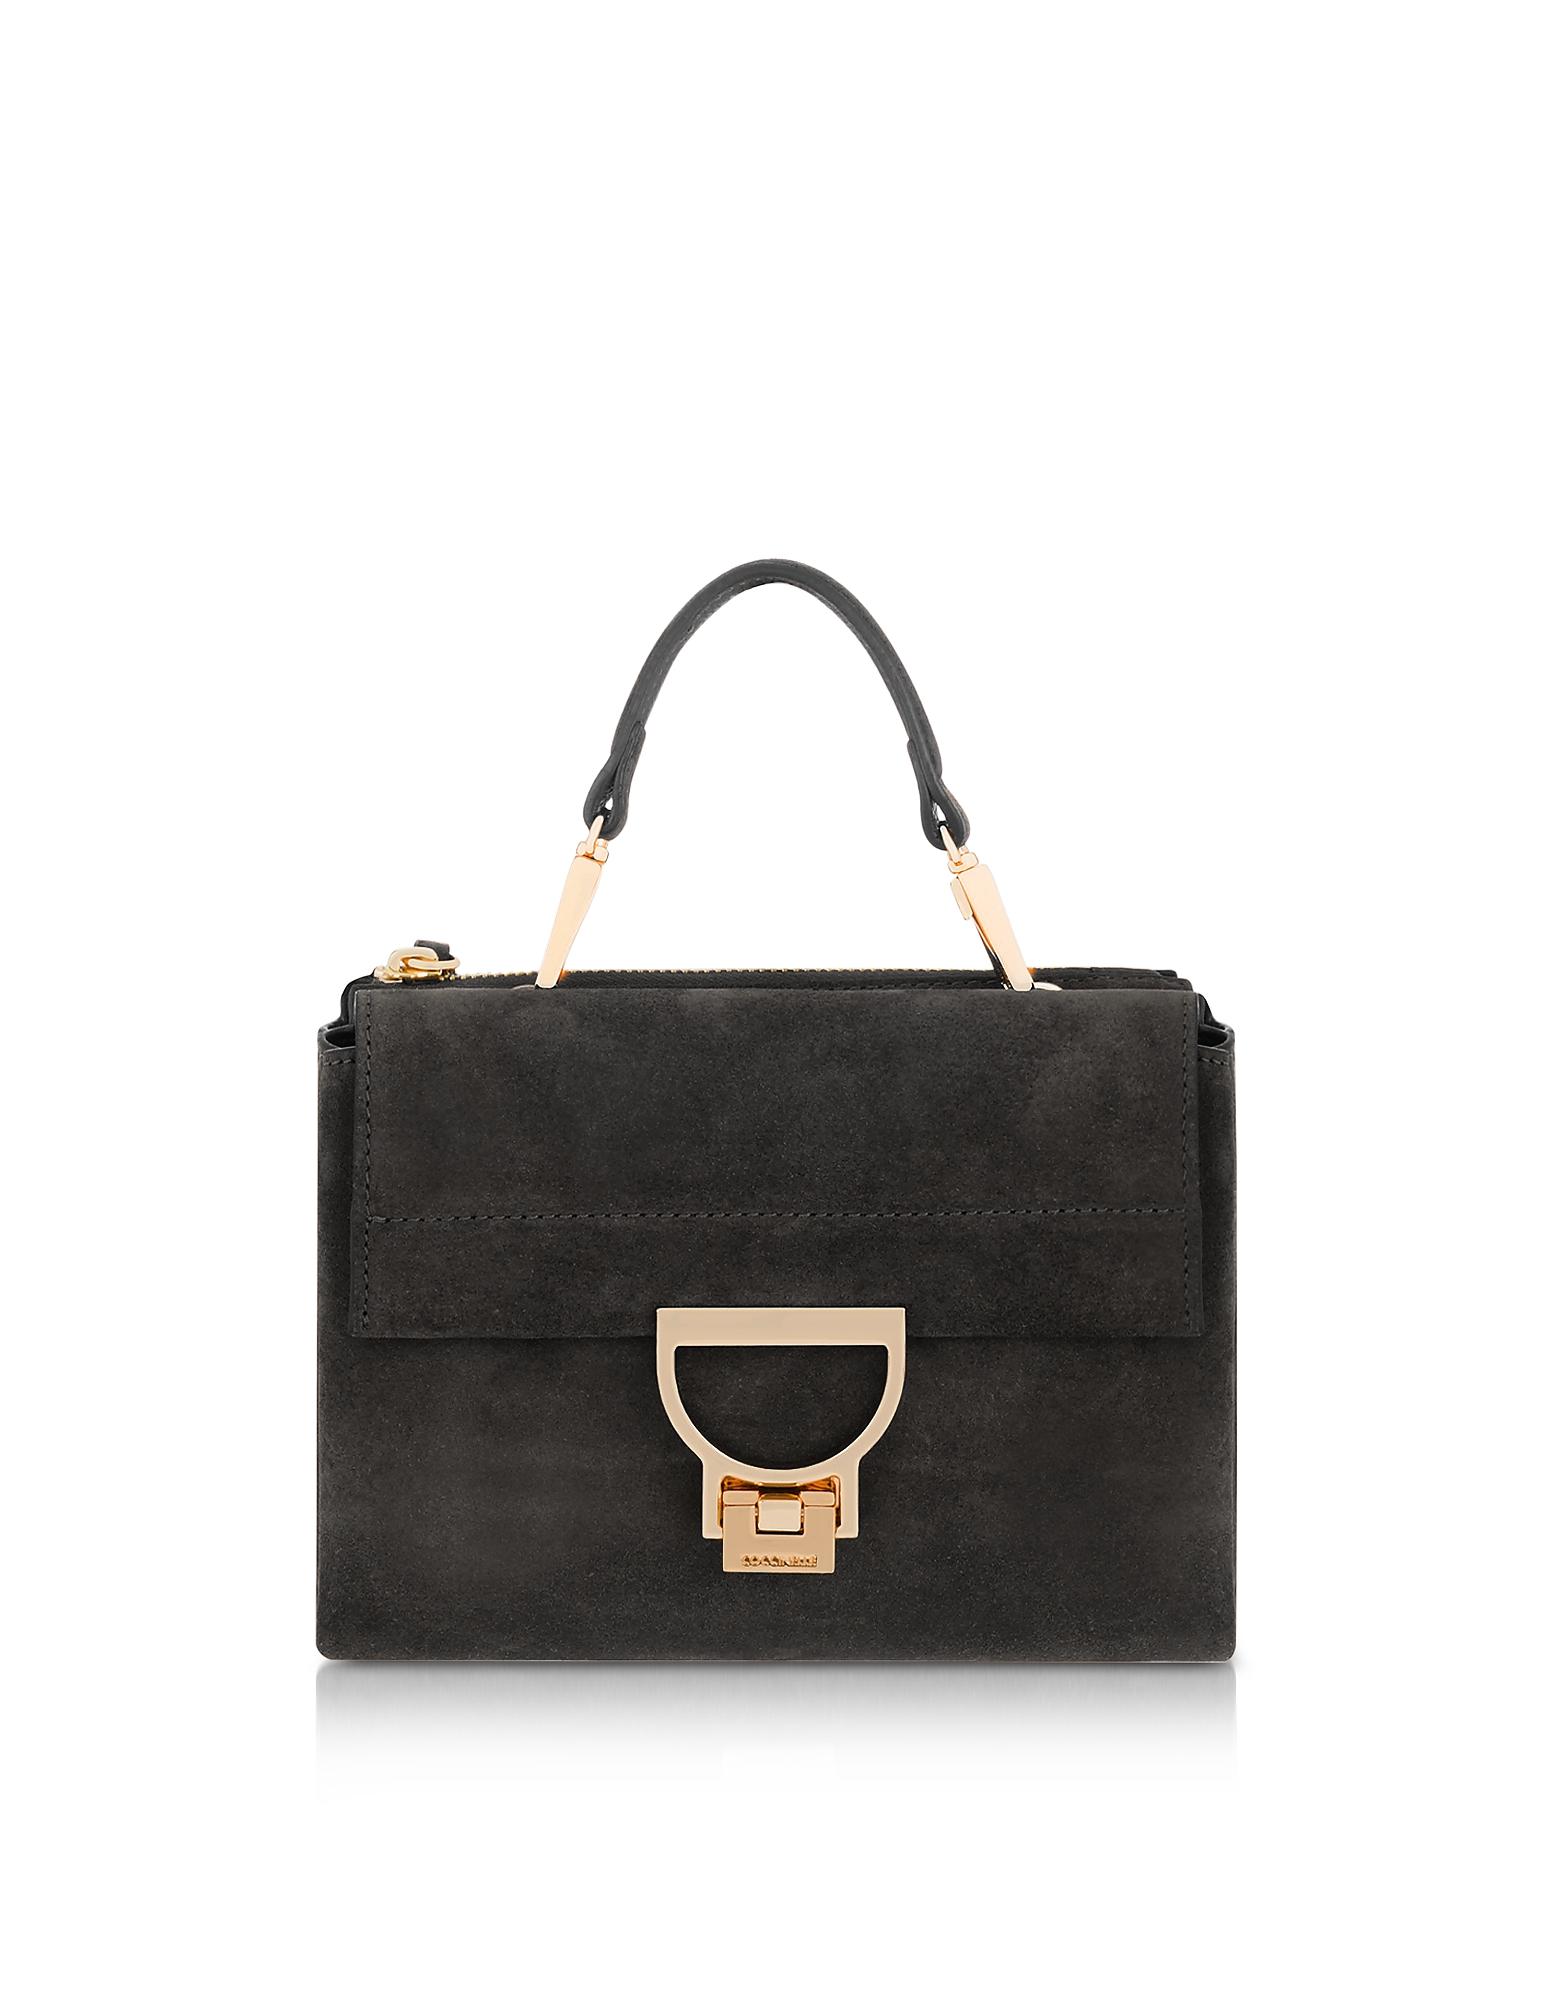 Coccinelle Handbags, Black Suede Arlettis Mini Bag w/Shoulder Strap